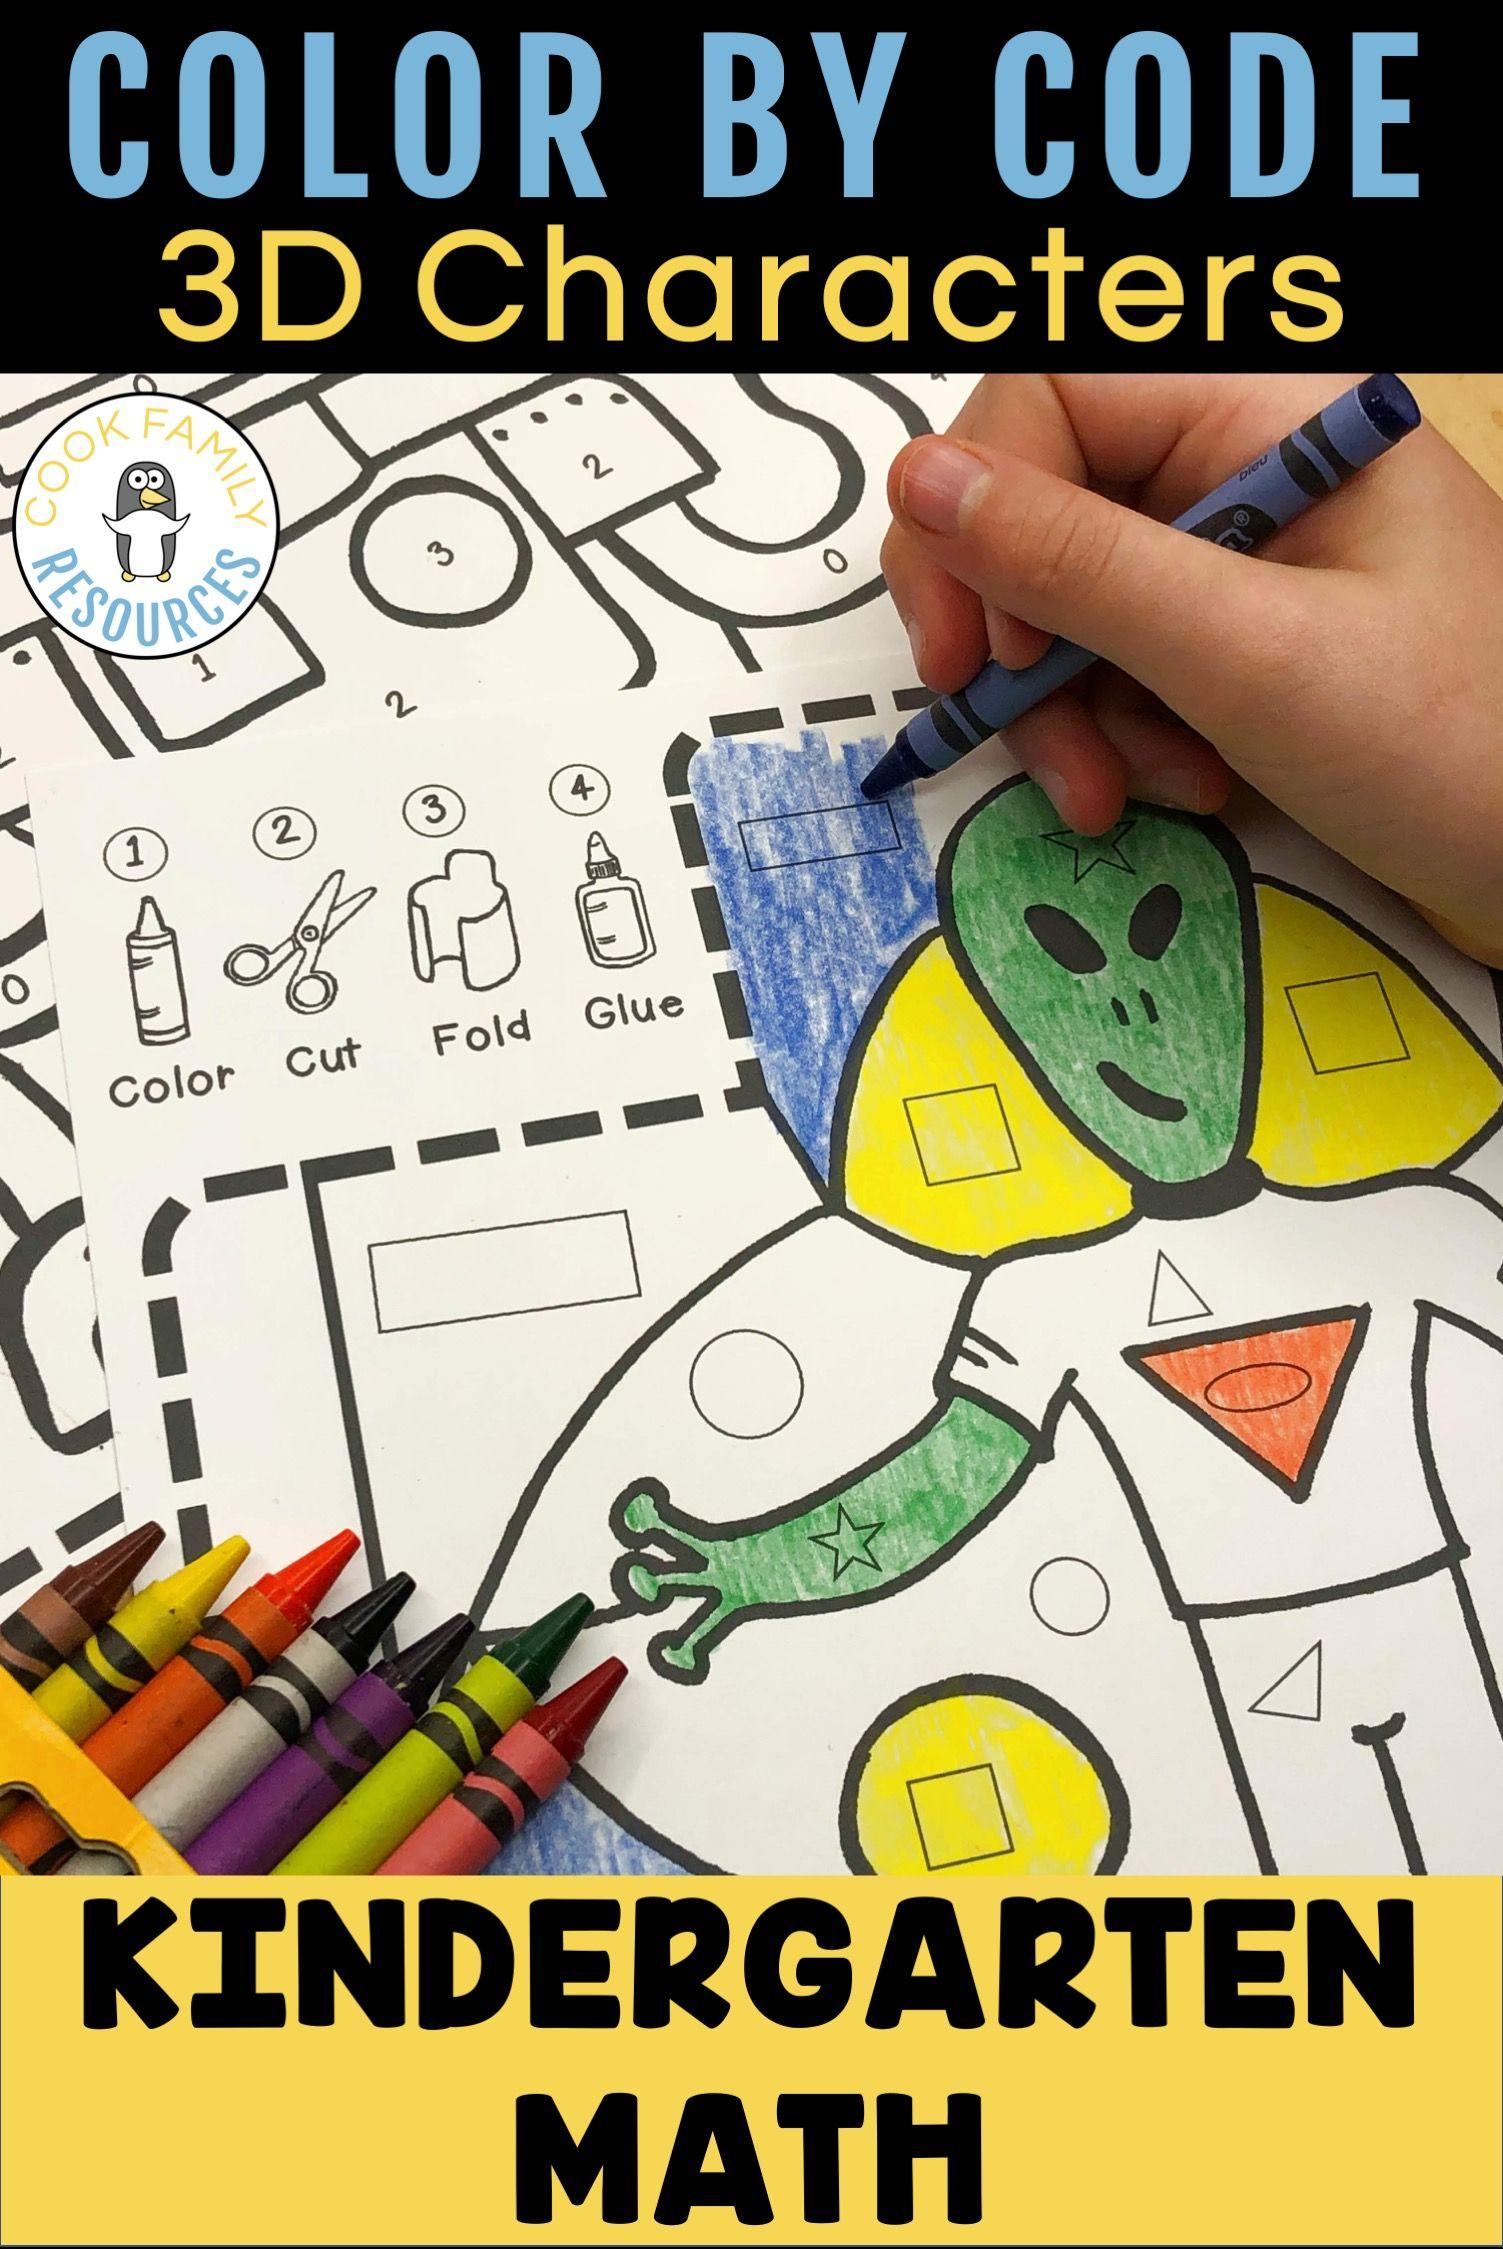 Kindergarten Math Color By Code